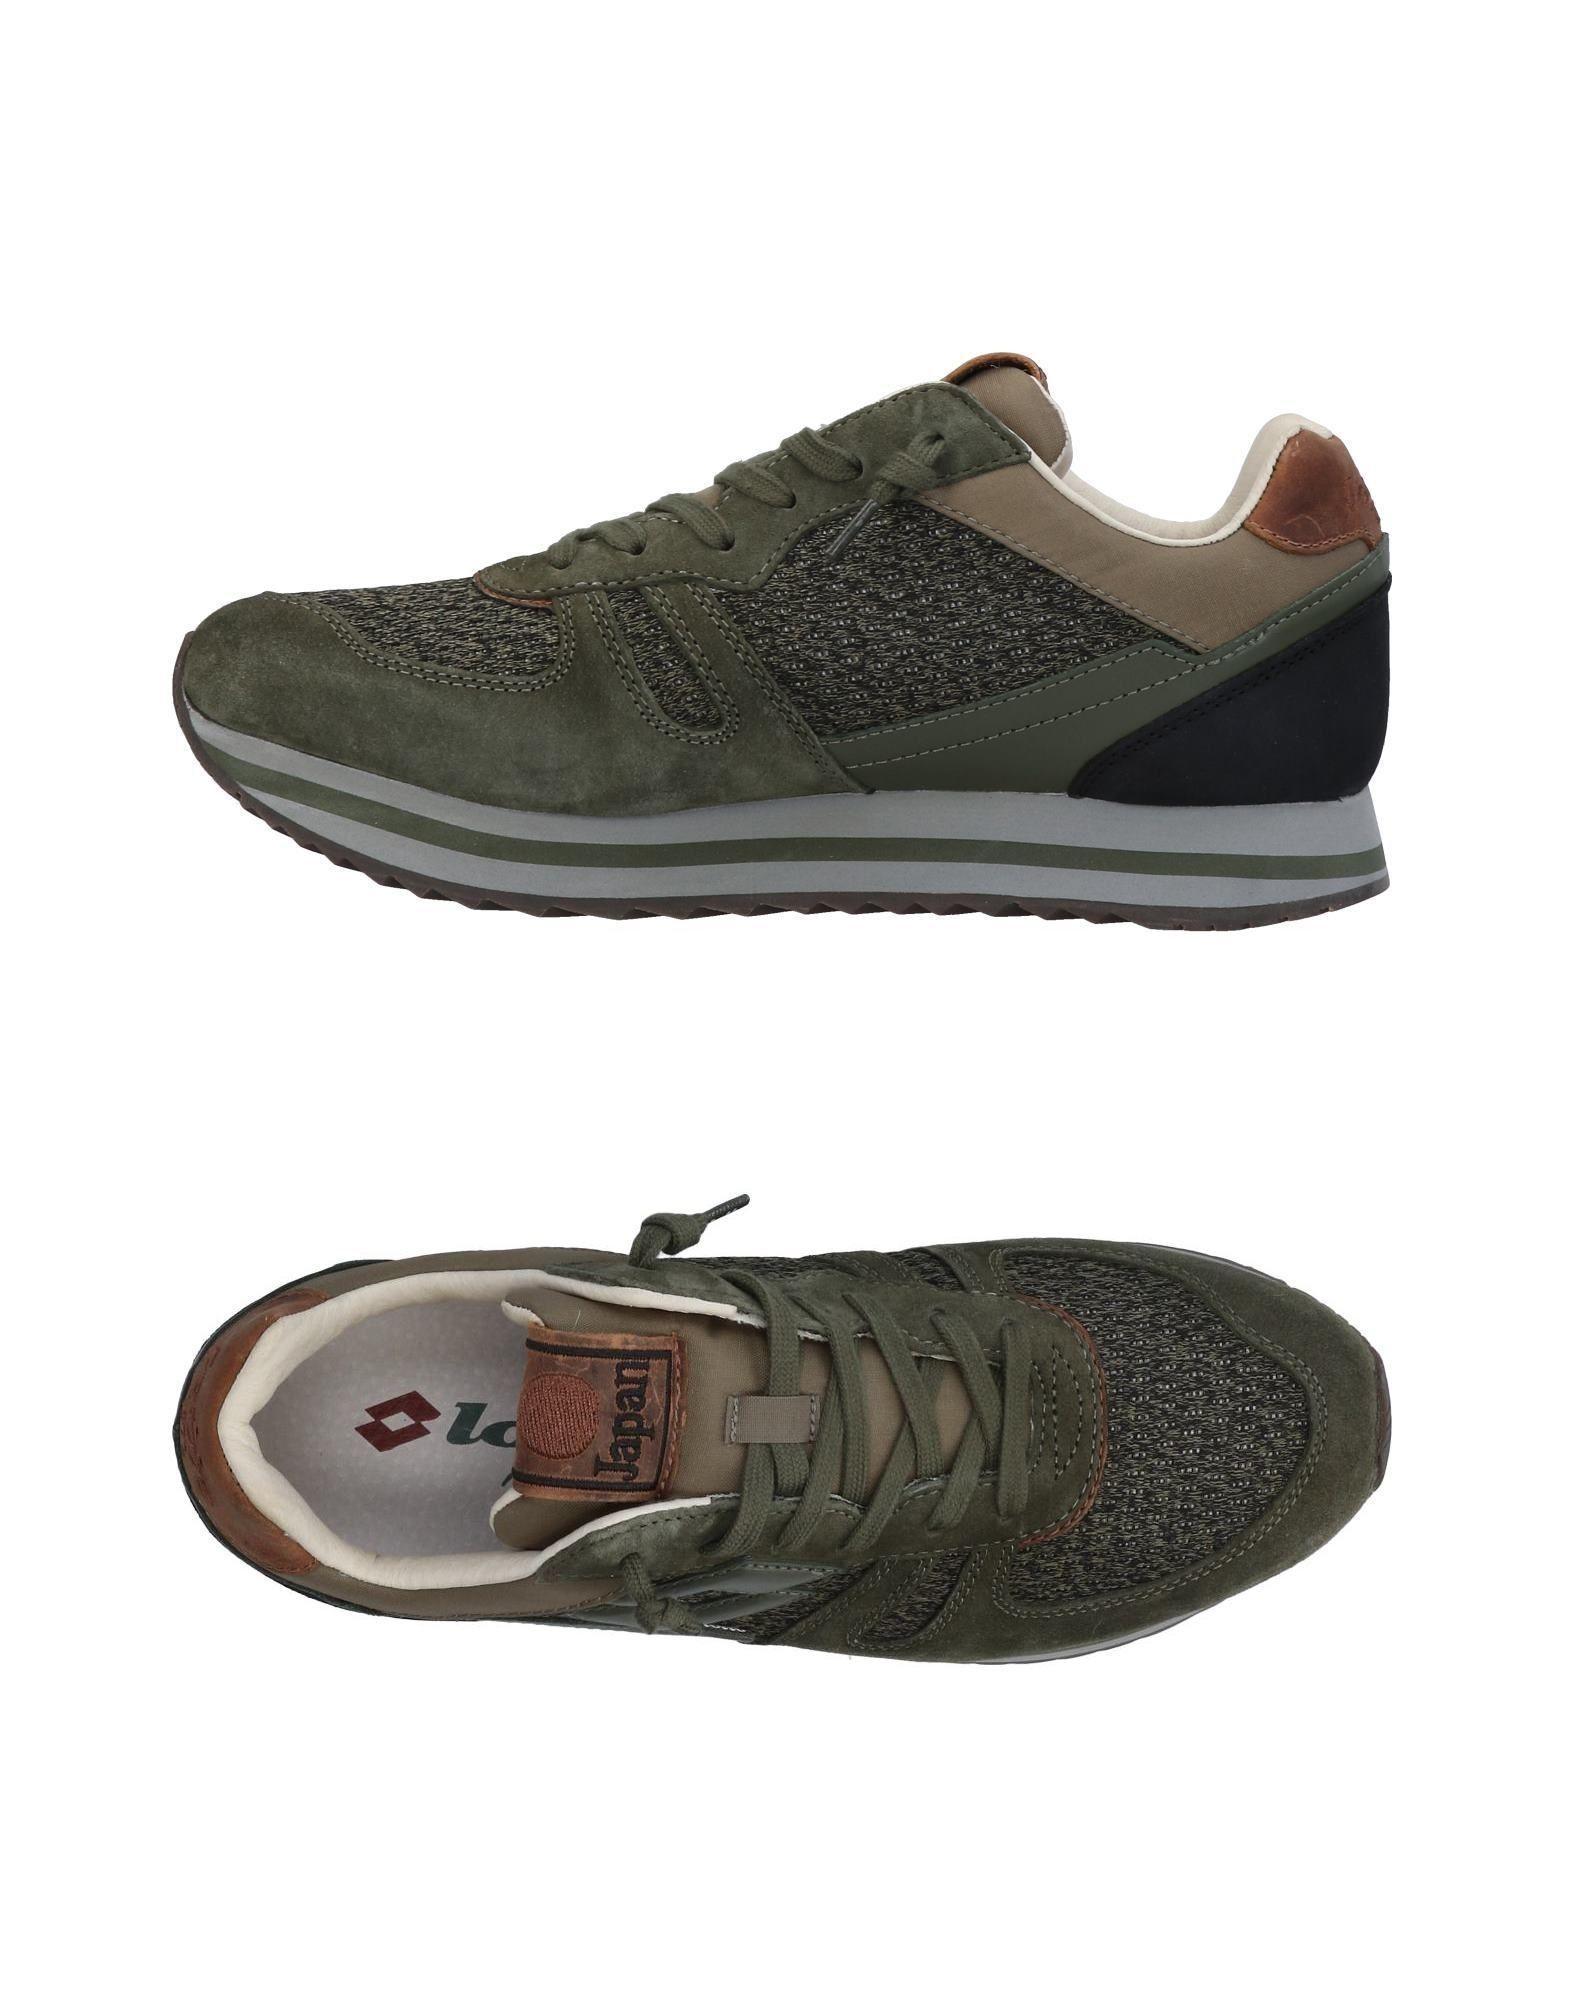 Lotto Leggenda Sneakers In Military Green